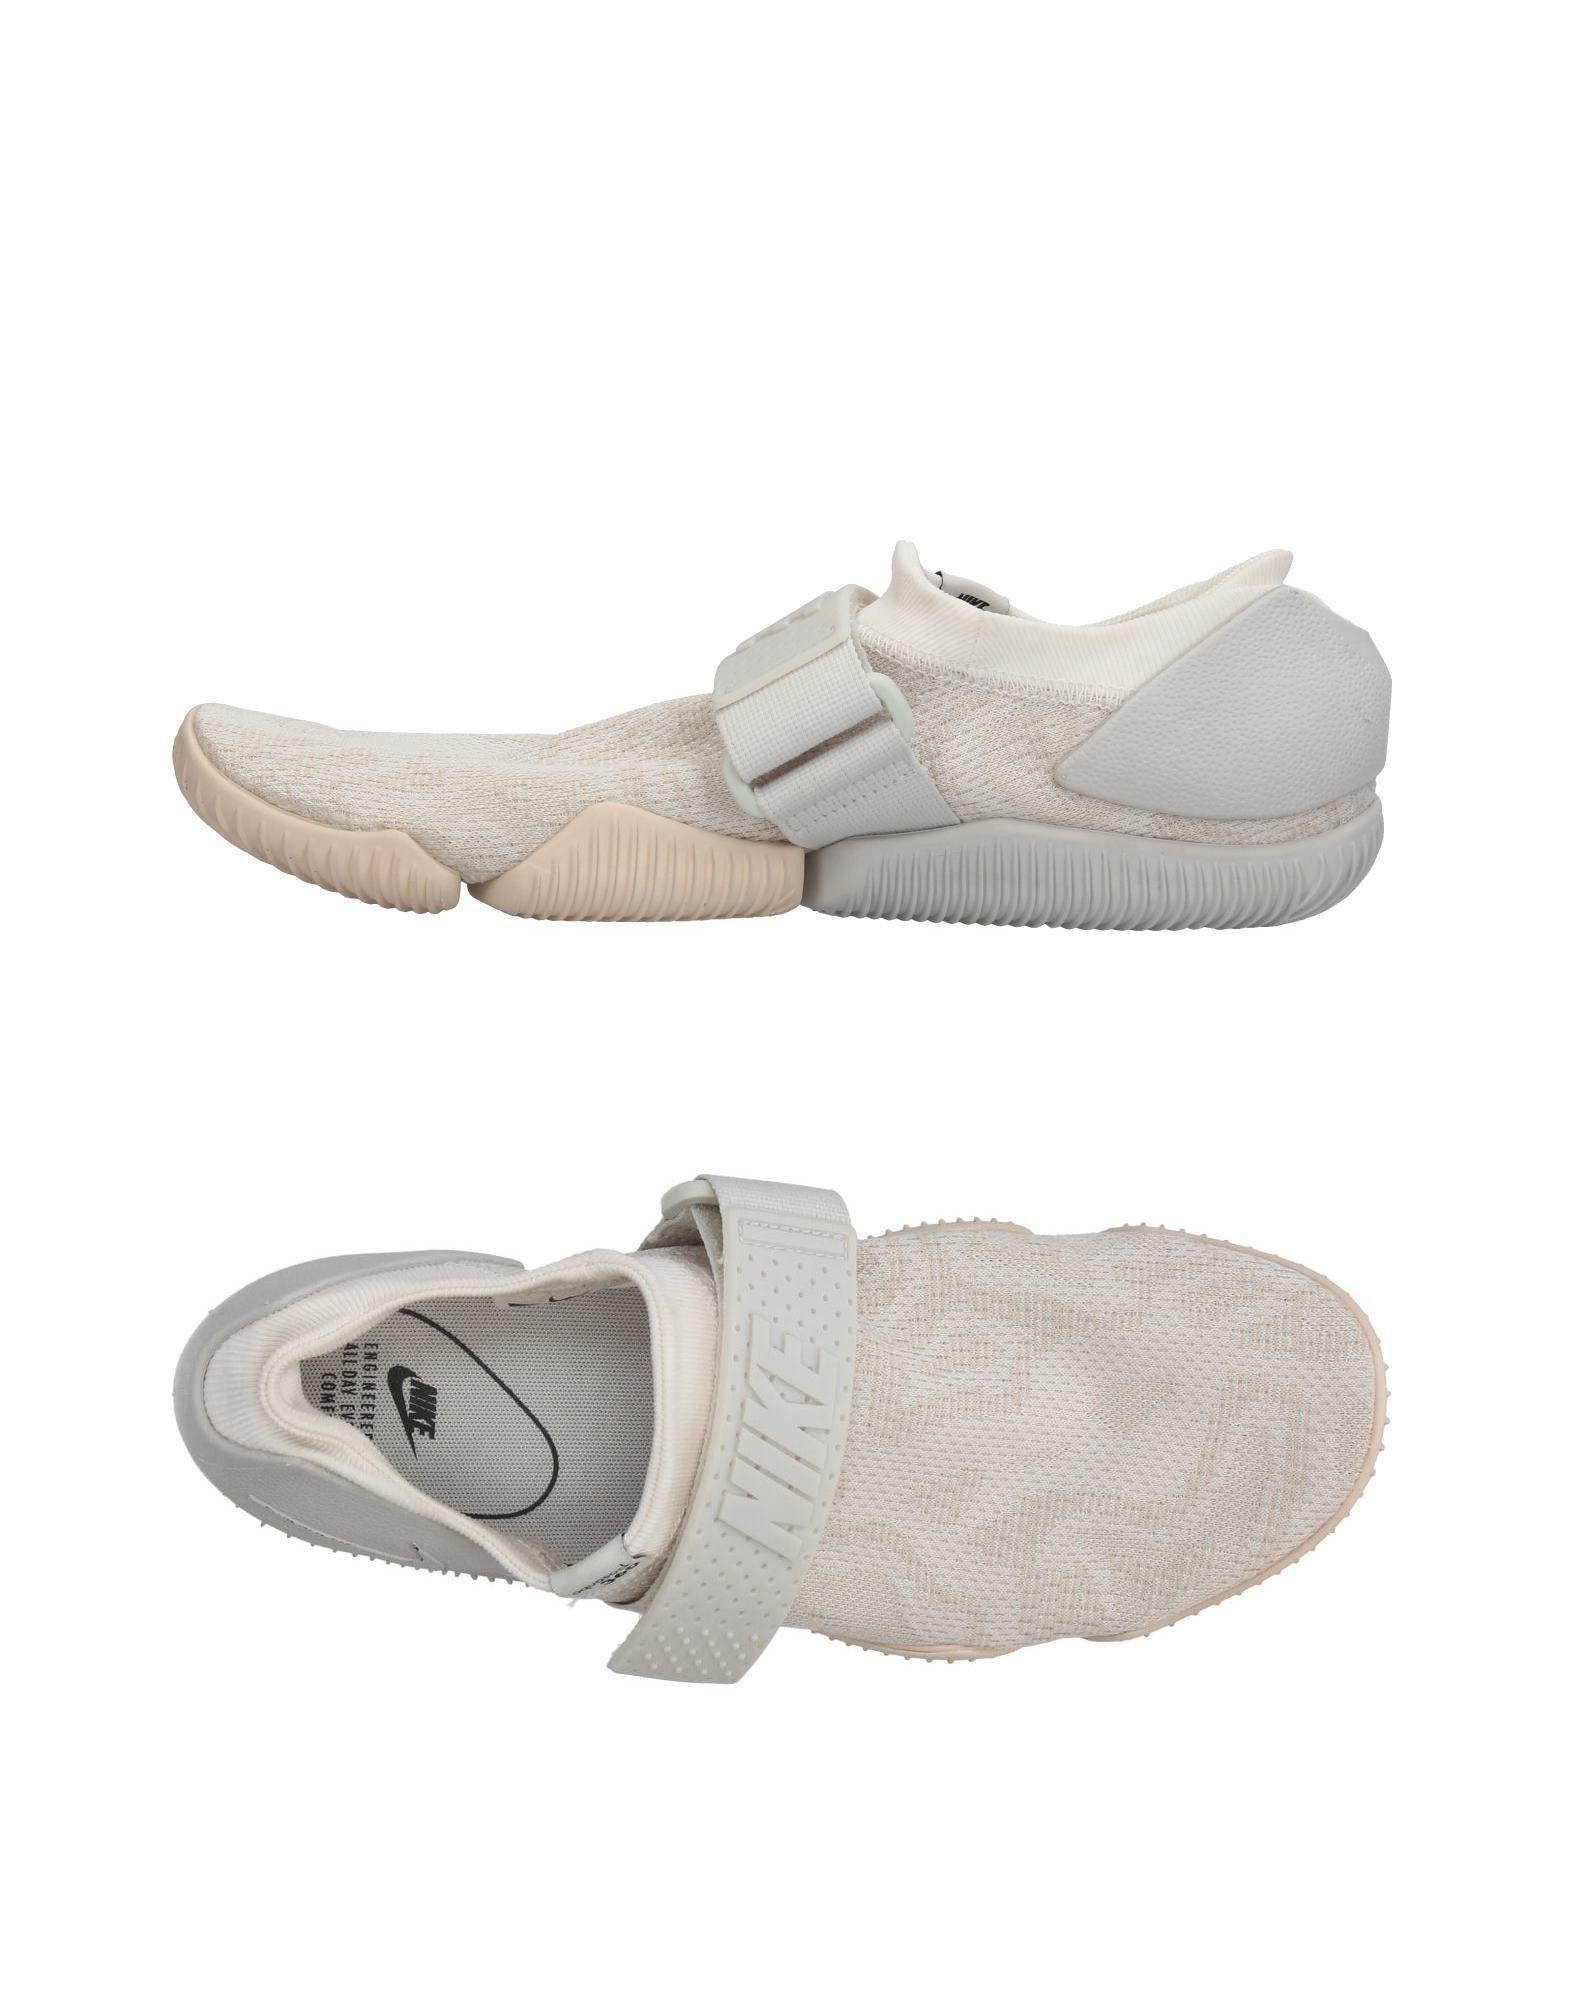 Sneakers Nike Uomo - 11384304JJ elegante